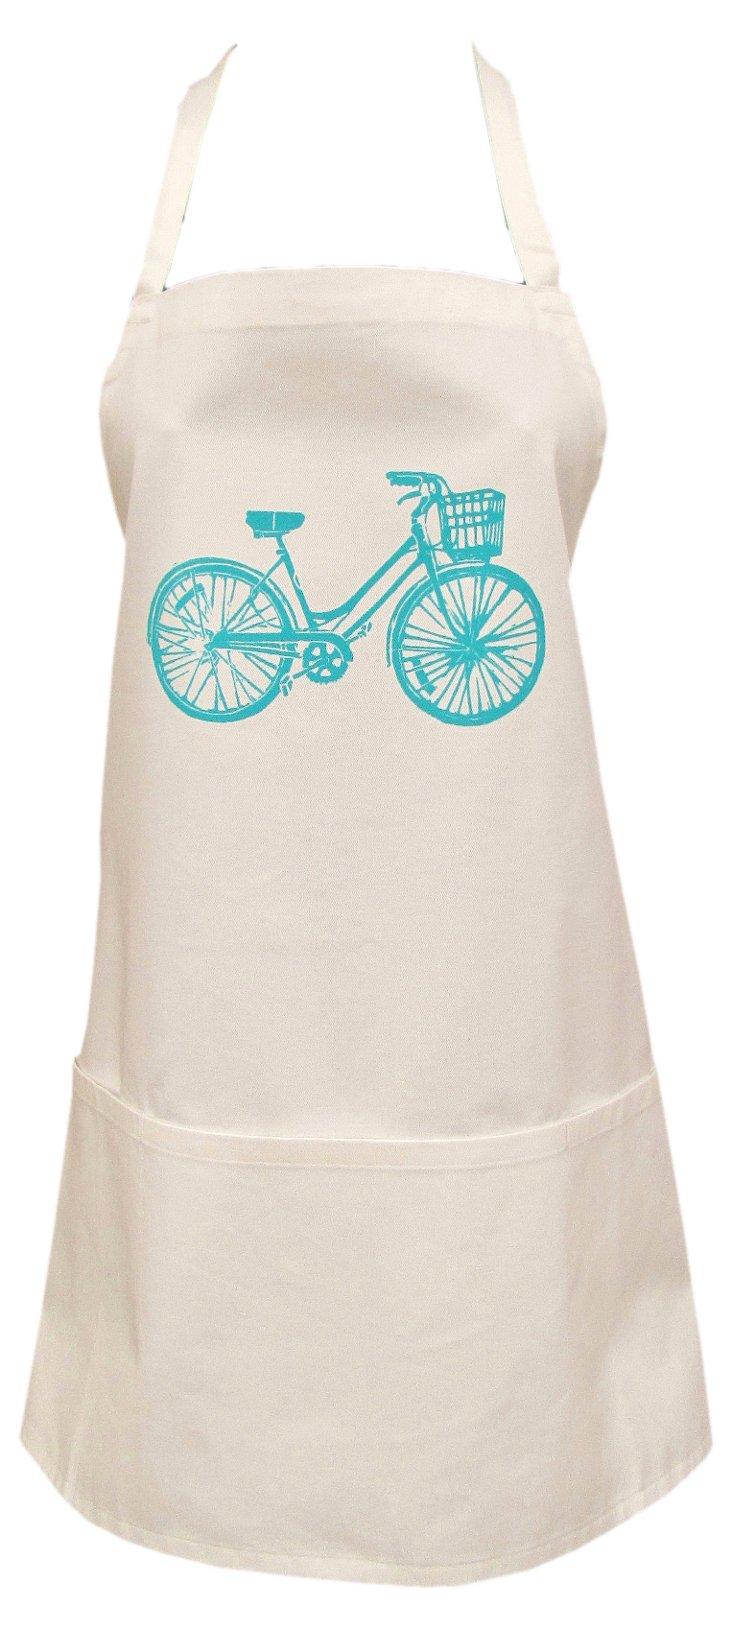 Organic Bicycle Full Apron, Turquoise